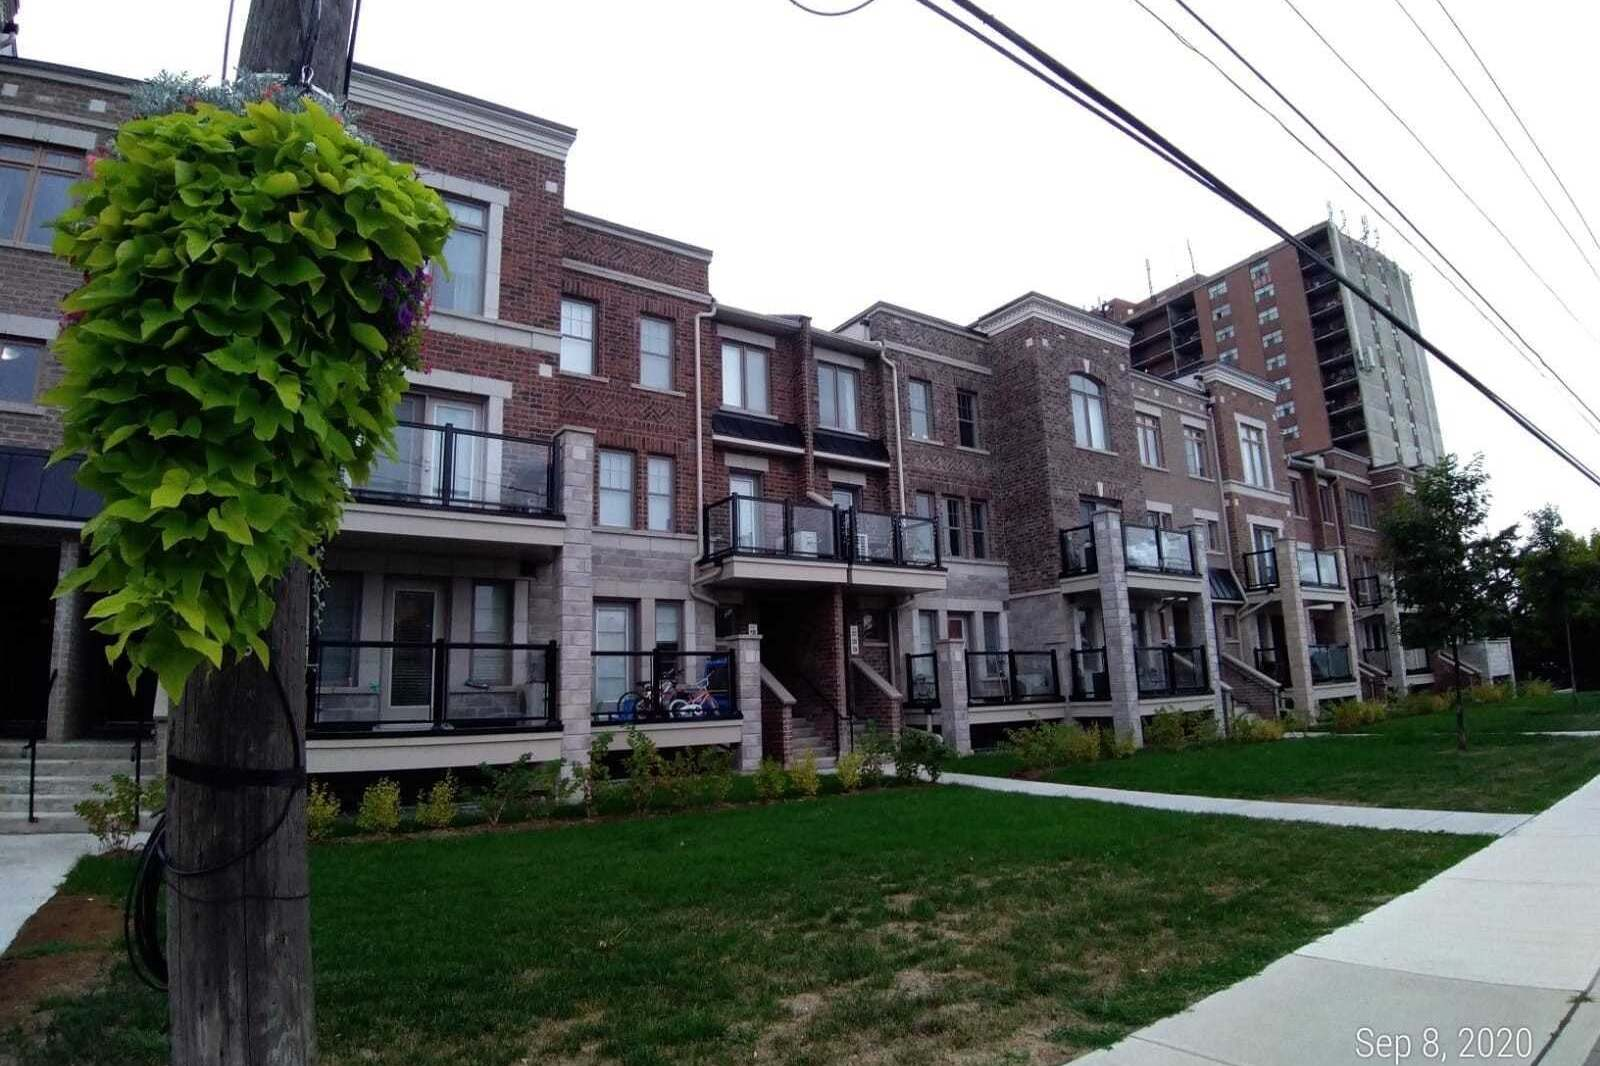 Buliding: 2355 Sheppard Avenue West, Toronto, ON